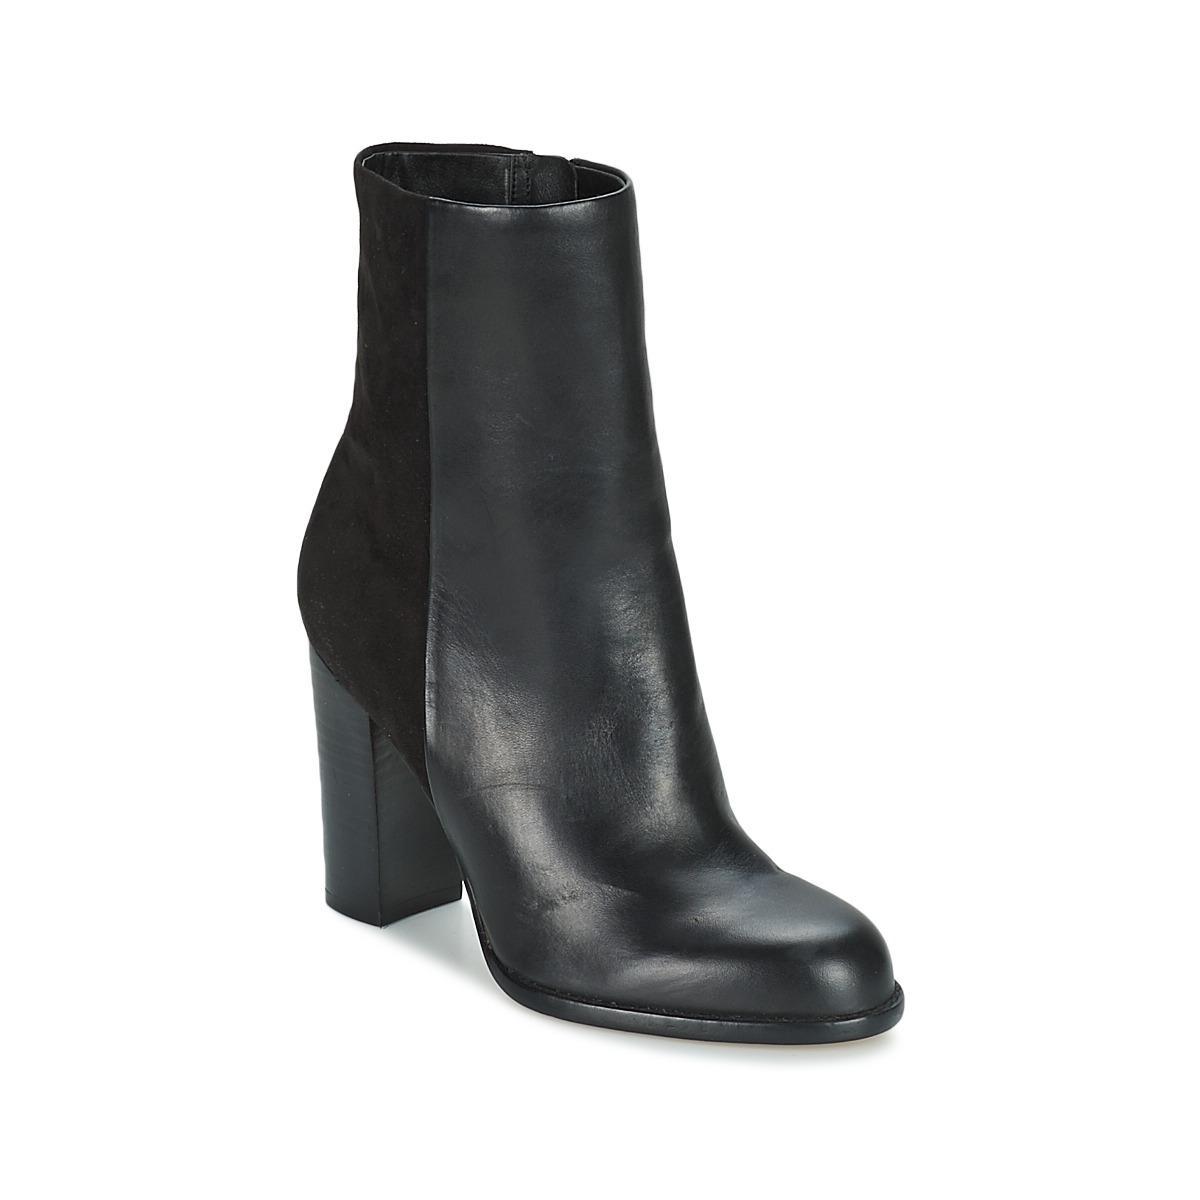 252b3892dfe3 hot sale 2017 Sam Edelman REYES BLACK Shoes Ankle boots Women ...